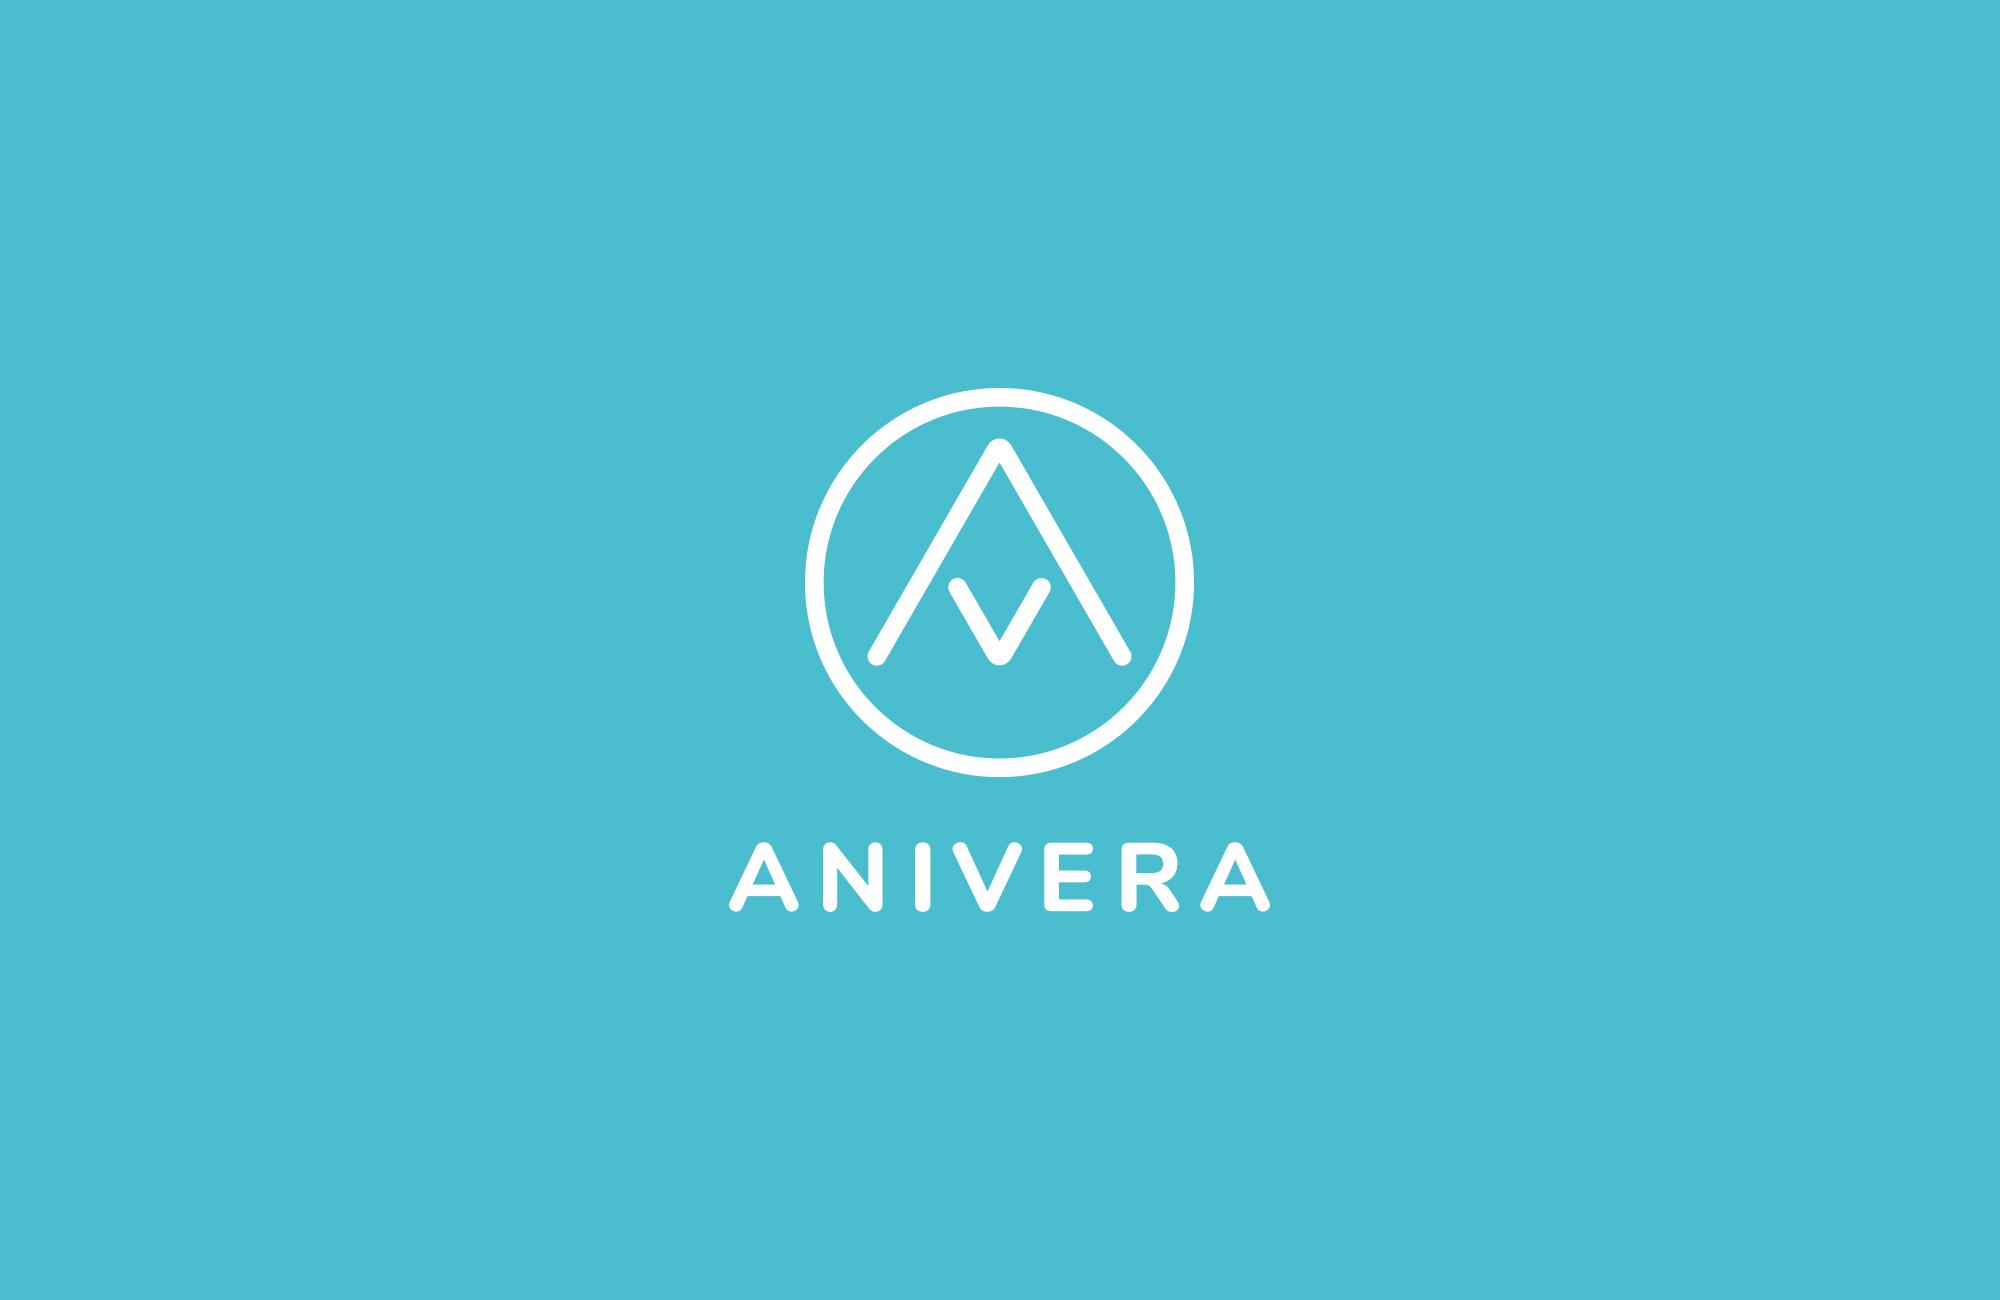 [album/Products_Model_Product/125/ANIVERA_logo_06.jpg]